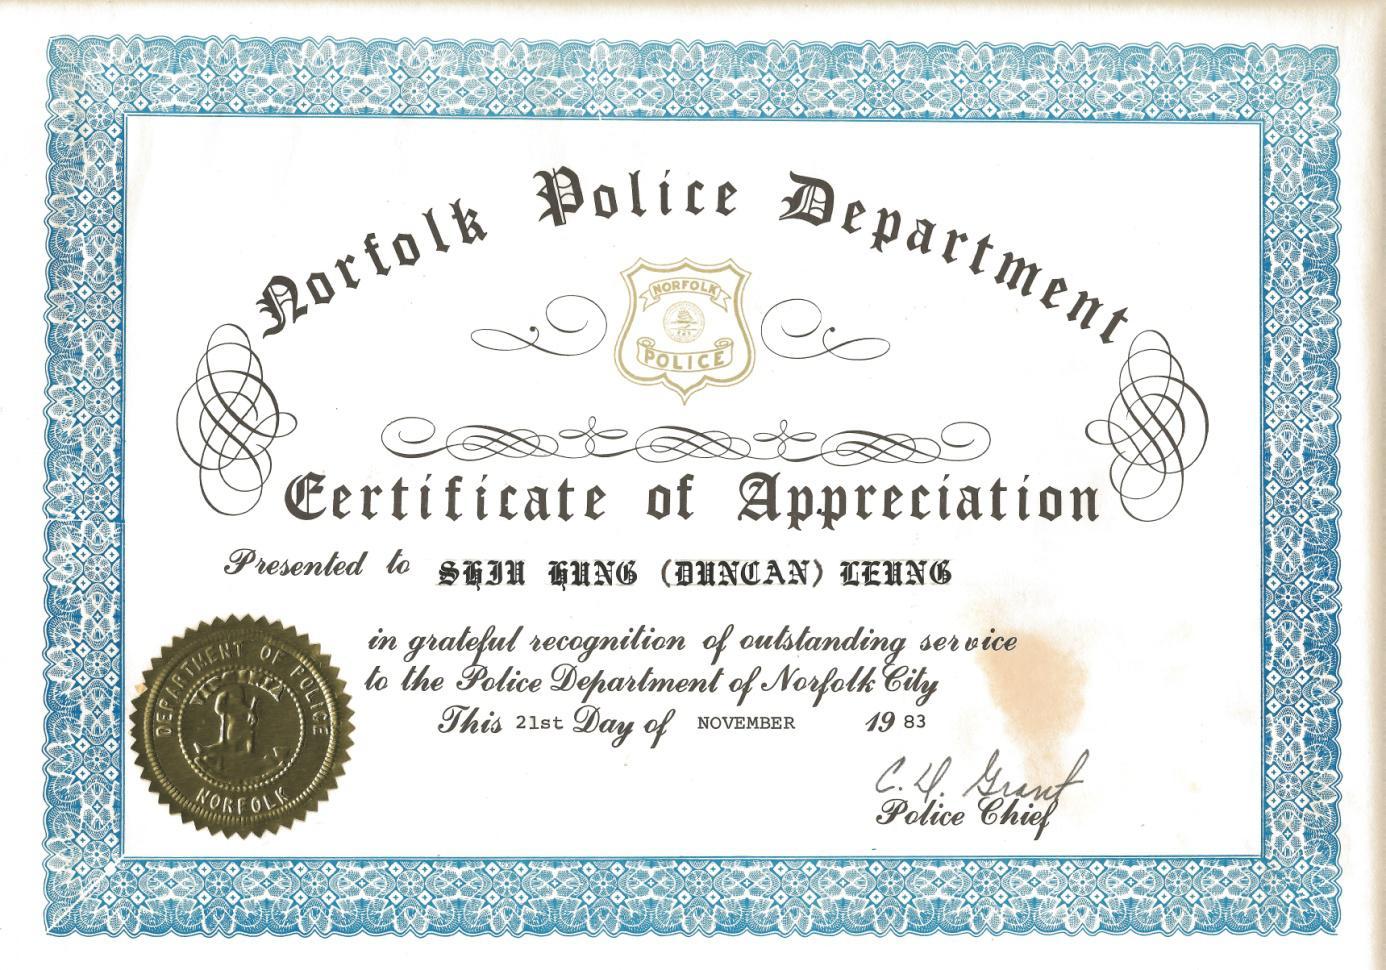 Norfolk police certificate